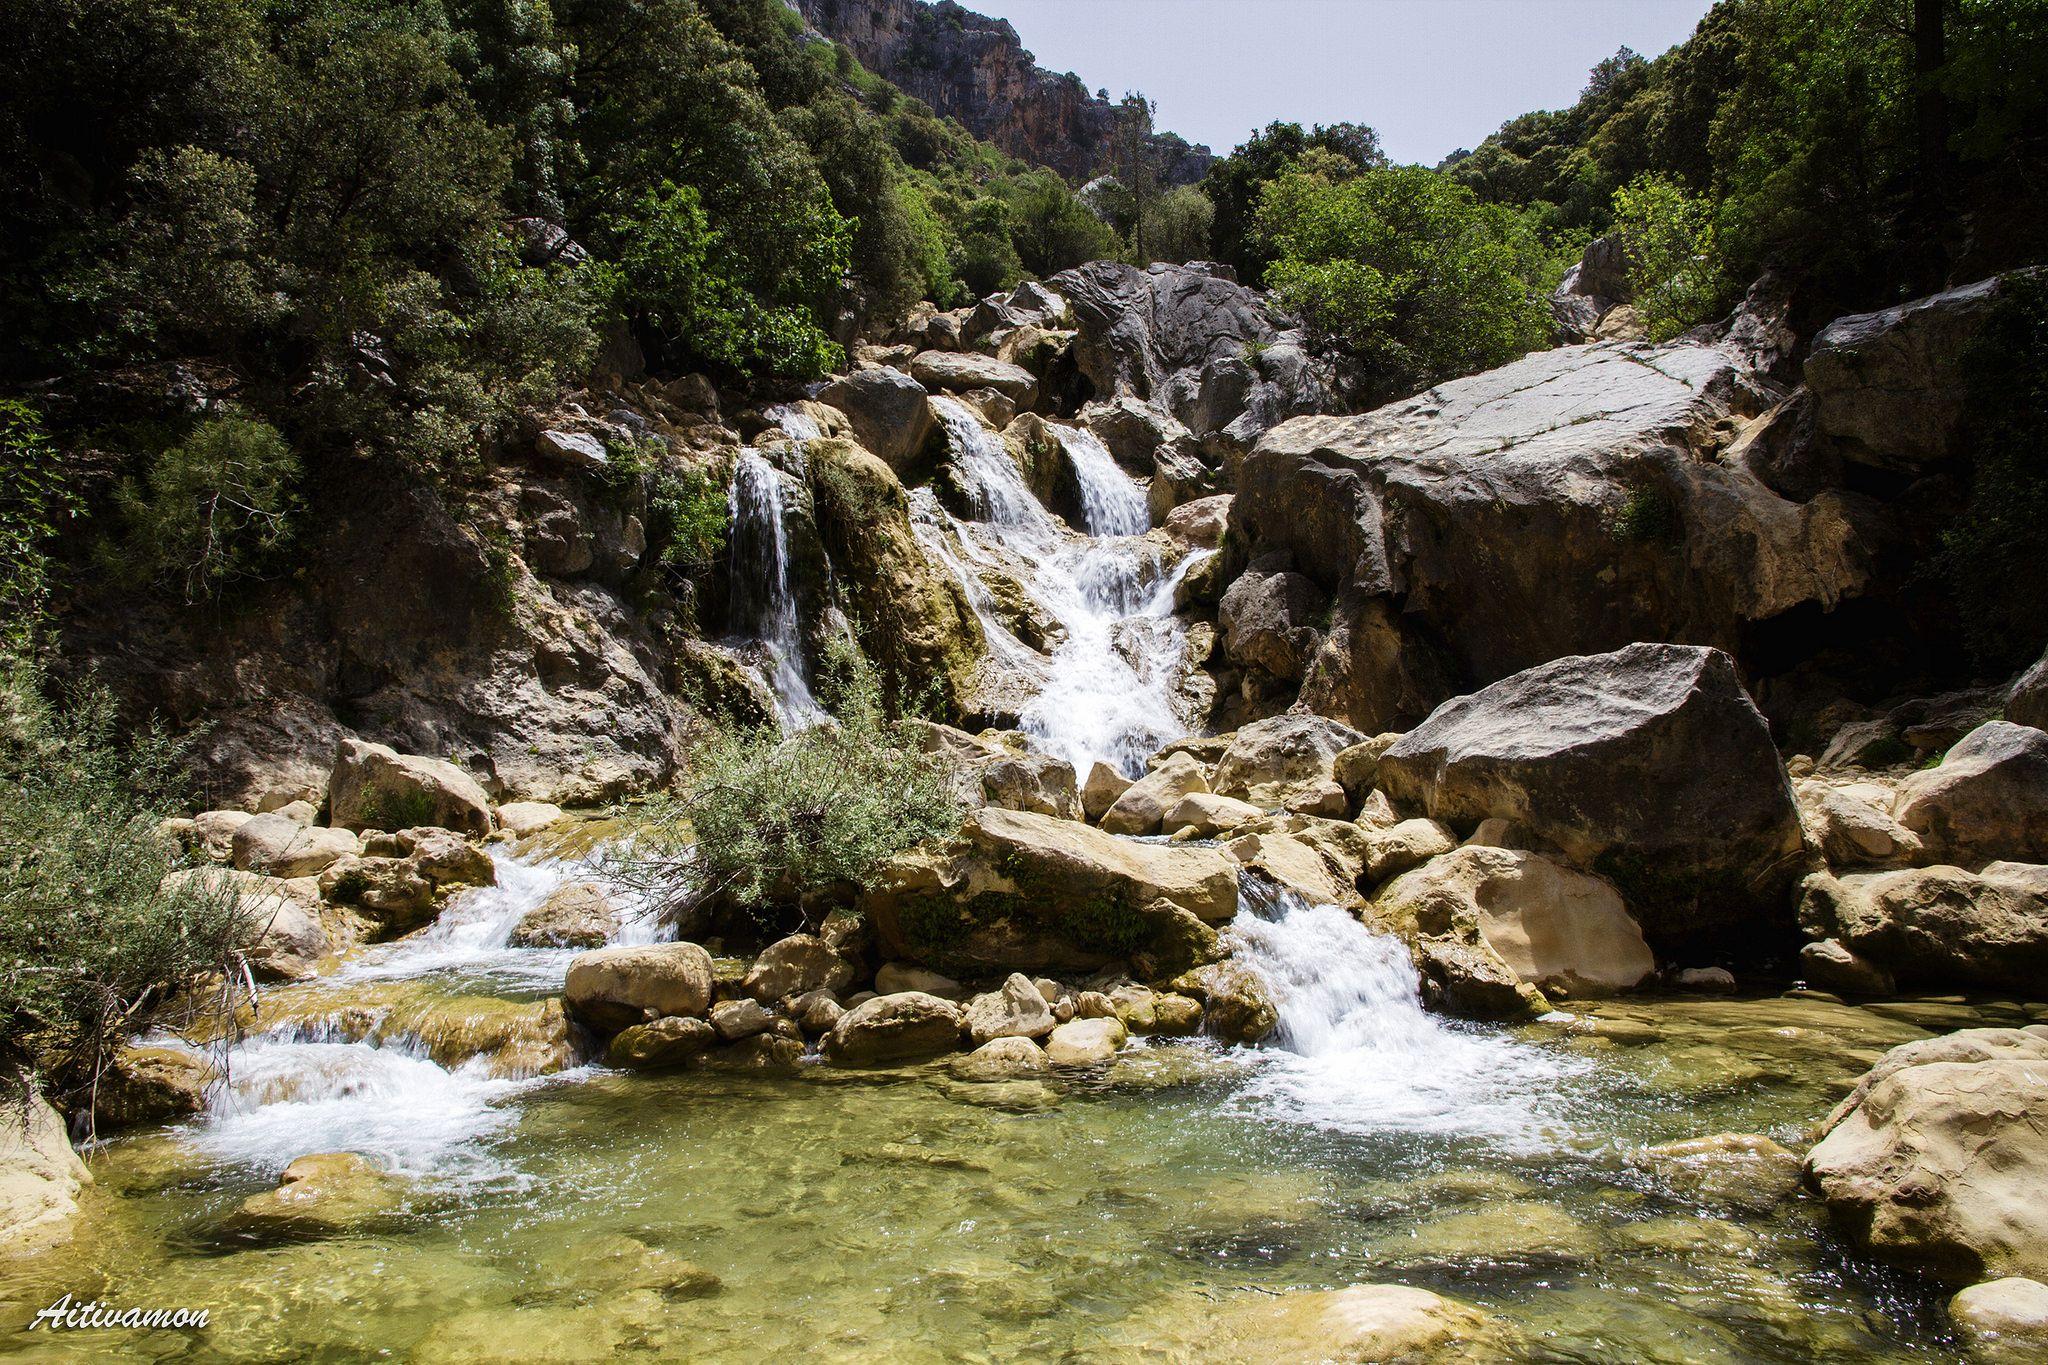 Cascada del río Guadalquivir, Cazorla, Jaén, #Spain